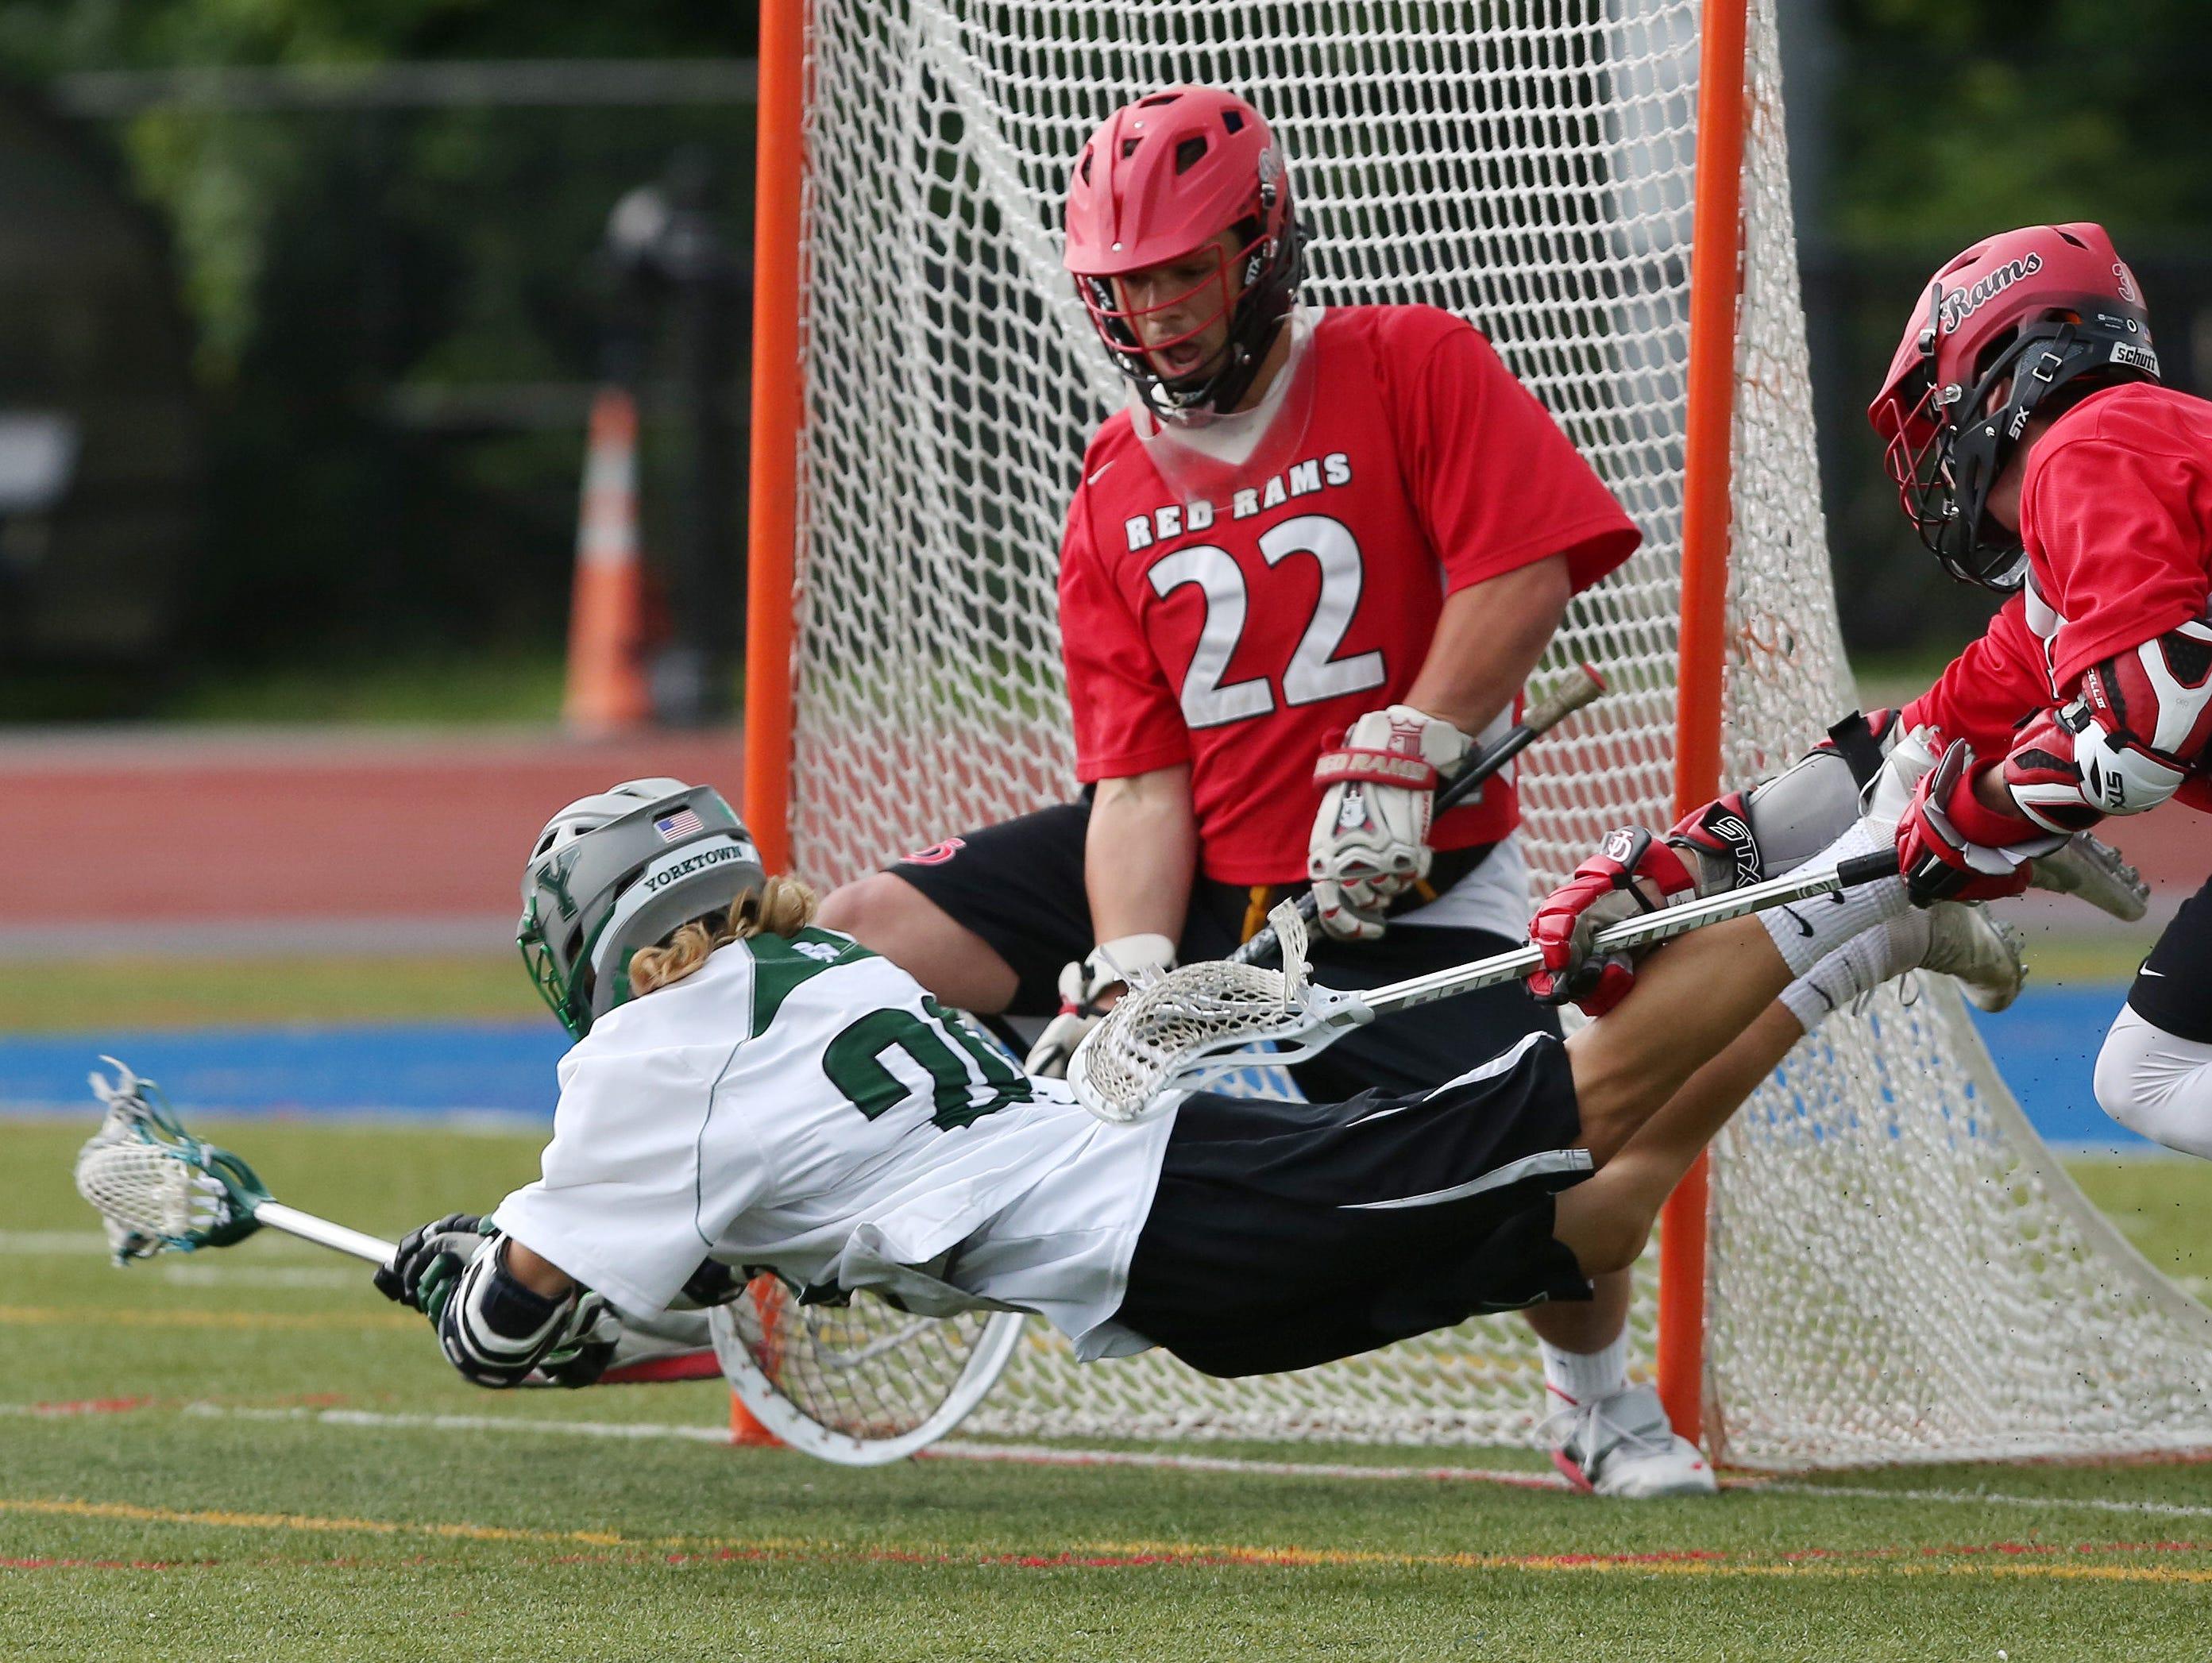 Jamesville-Dewitt goalie Dylan Fleischmann (22) stops a shot from Yorktown's Shane Dahlke (29) during the NYSPHSAA Class B championship lacrosse game at Middletown High School June 11, 2016. Jamesville-Dewitt won the game 9-6.